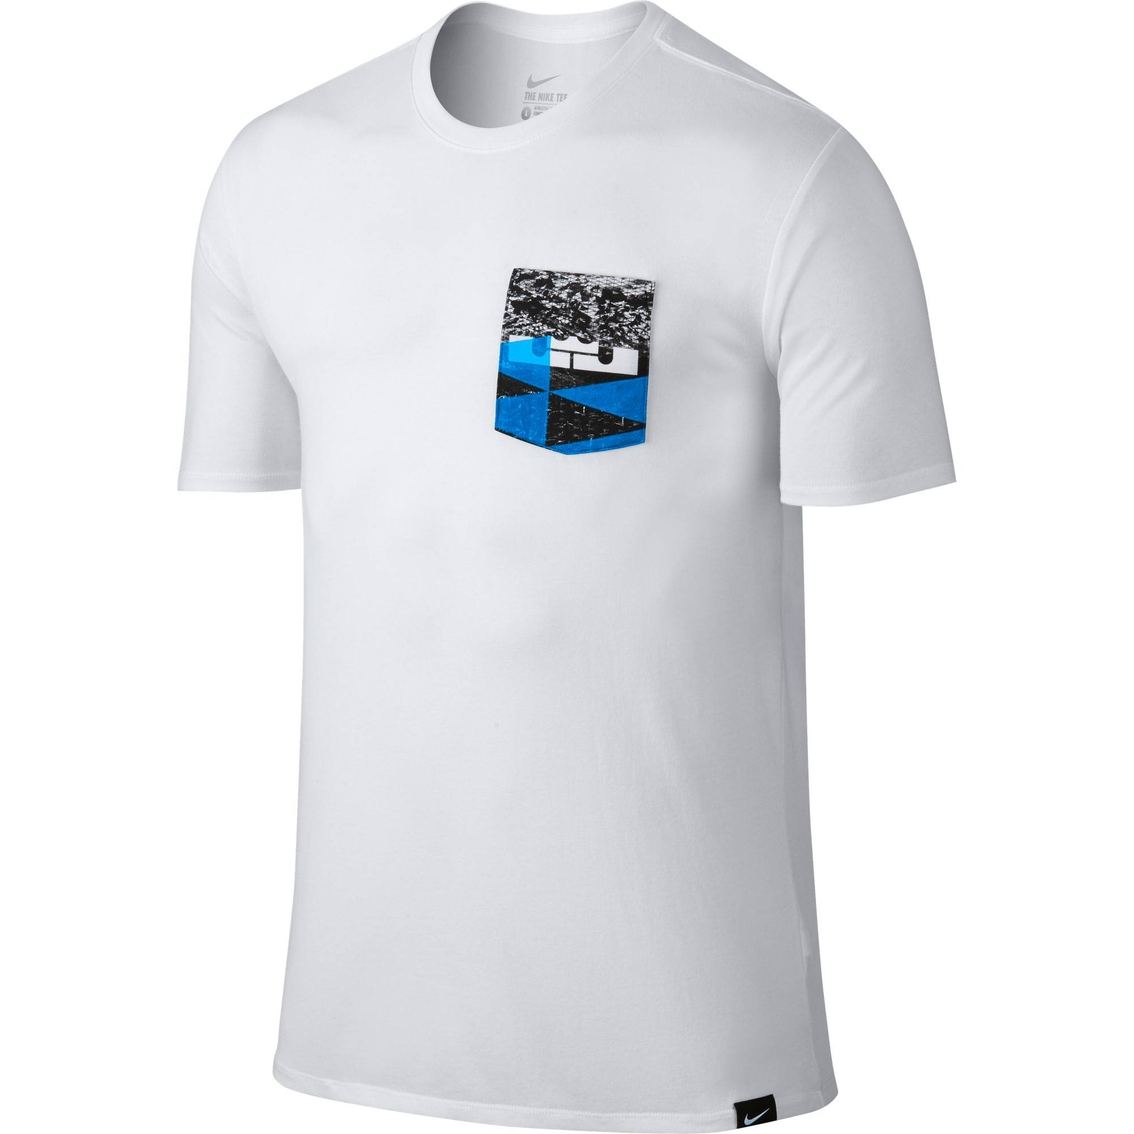 purchase cheap 76652 2d7e1 Nike Lebron Rubber City Pocket Tee